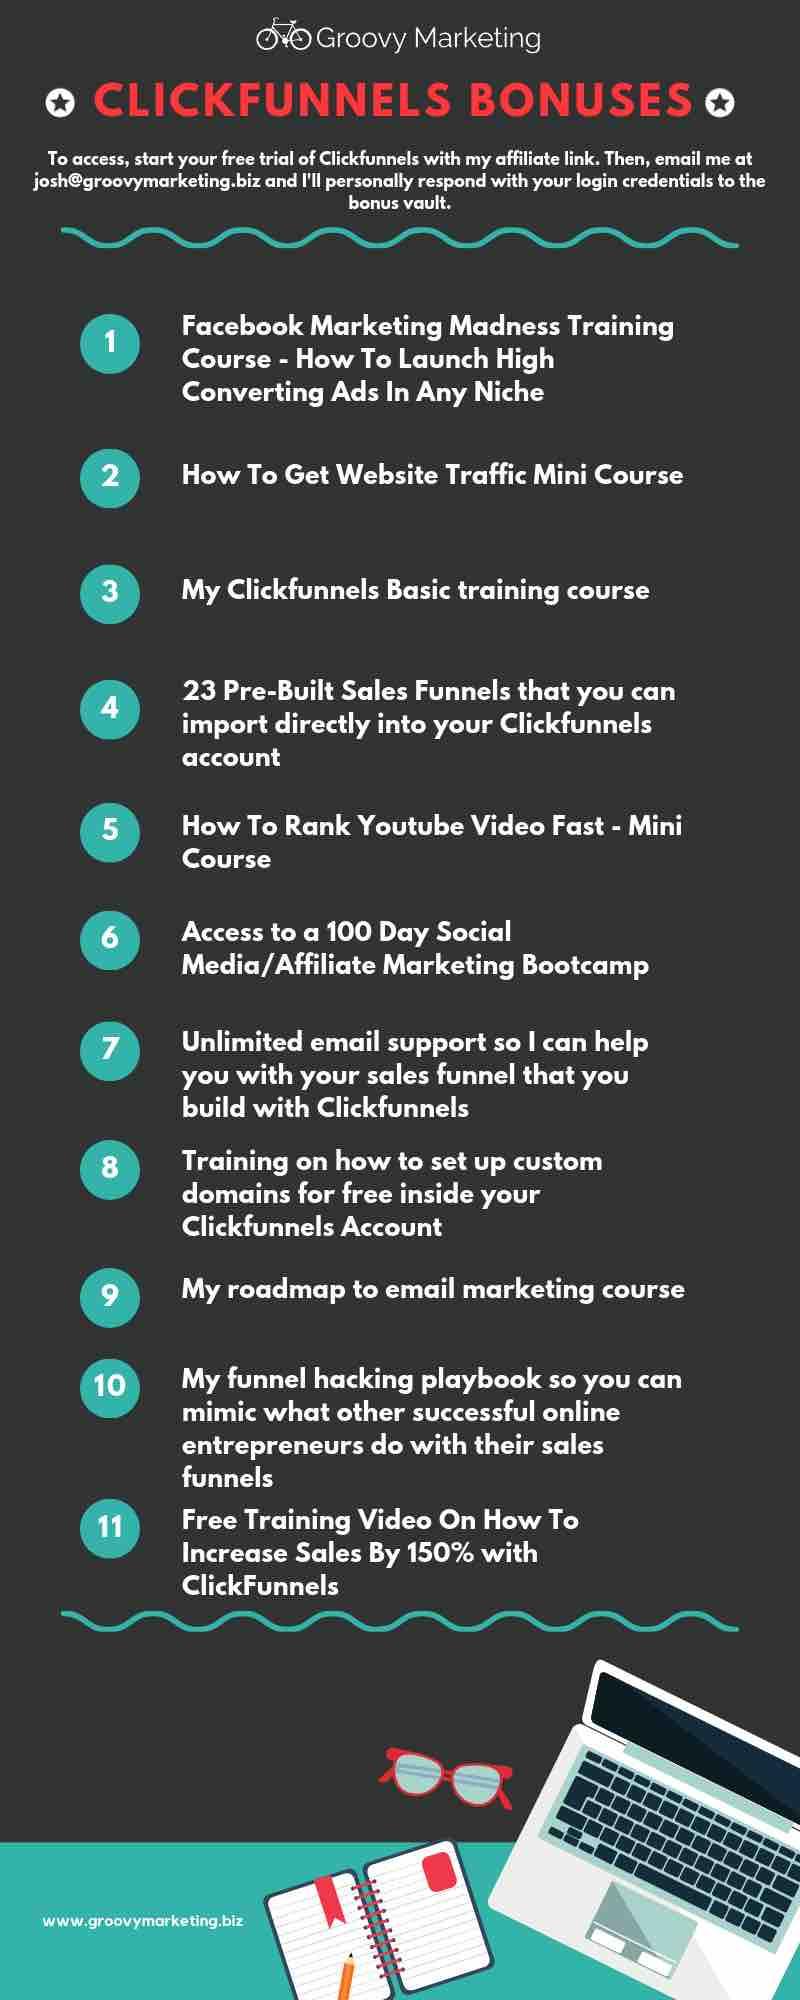 Clickfunnels-pricing-bonuses-infographic.jpg